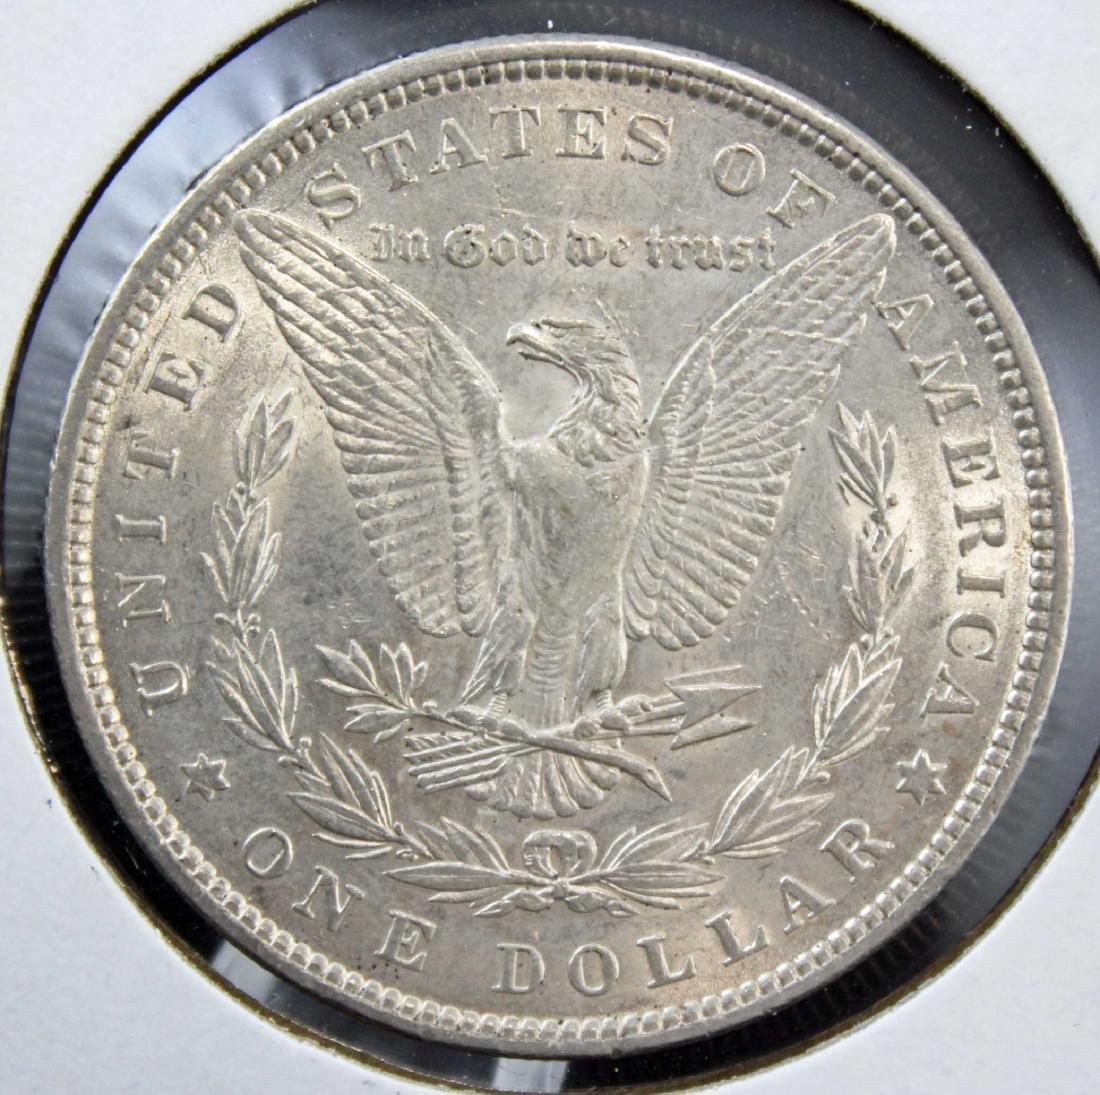 2 Morgan Silver Dollars w/ Errors 1882 P & 1884 O - 3